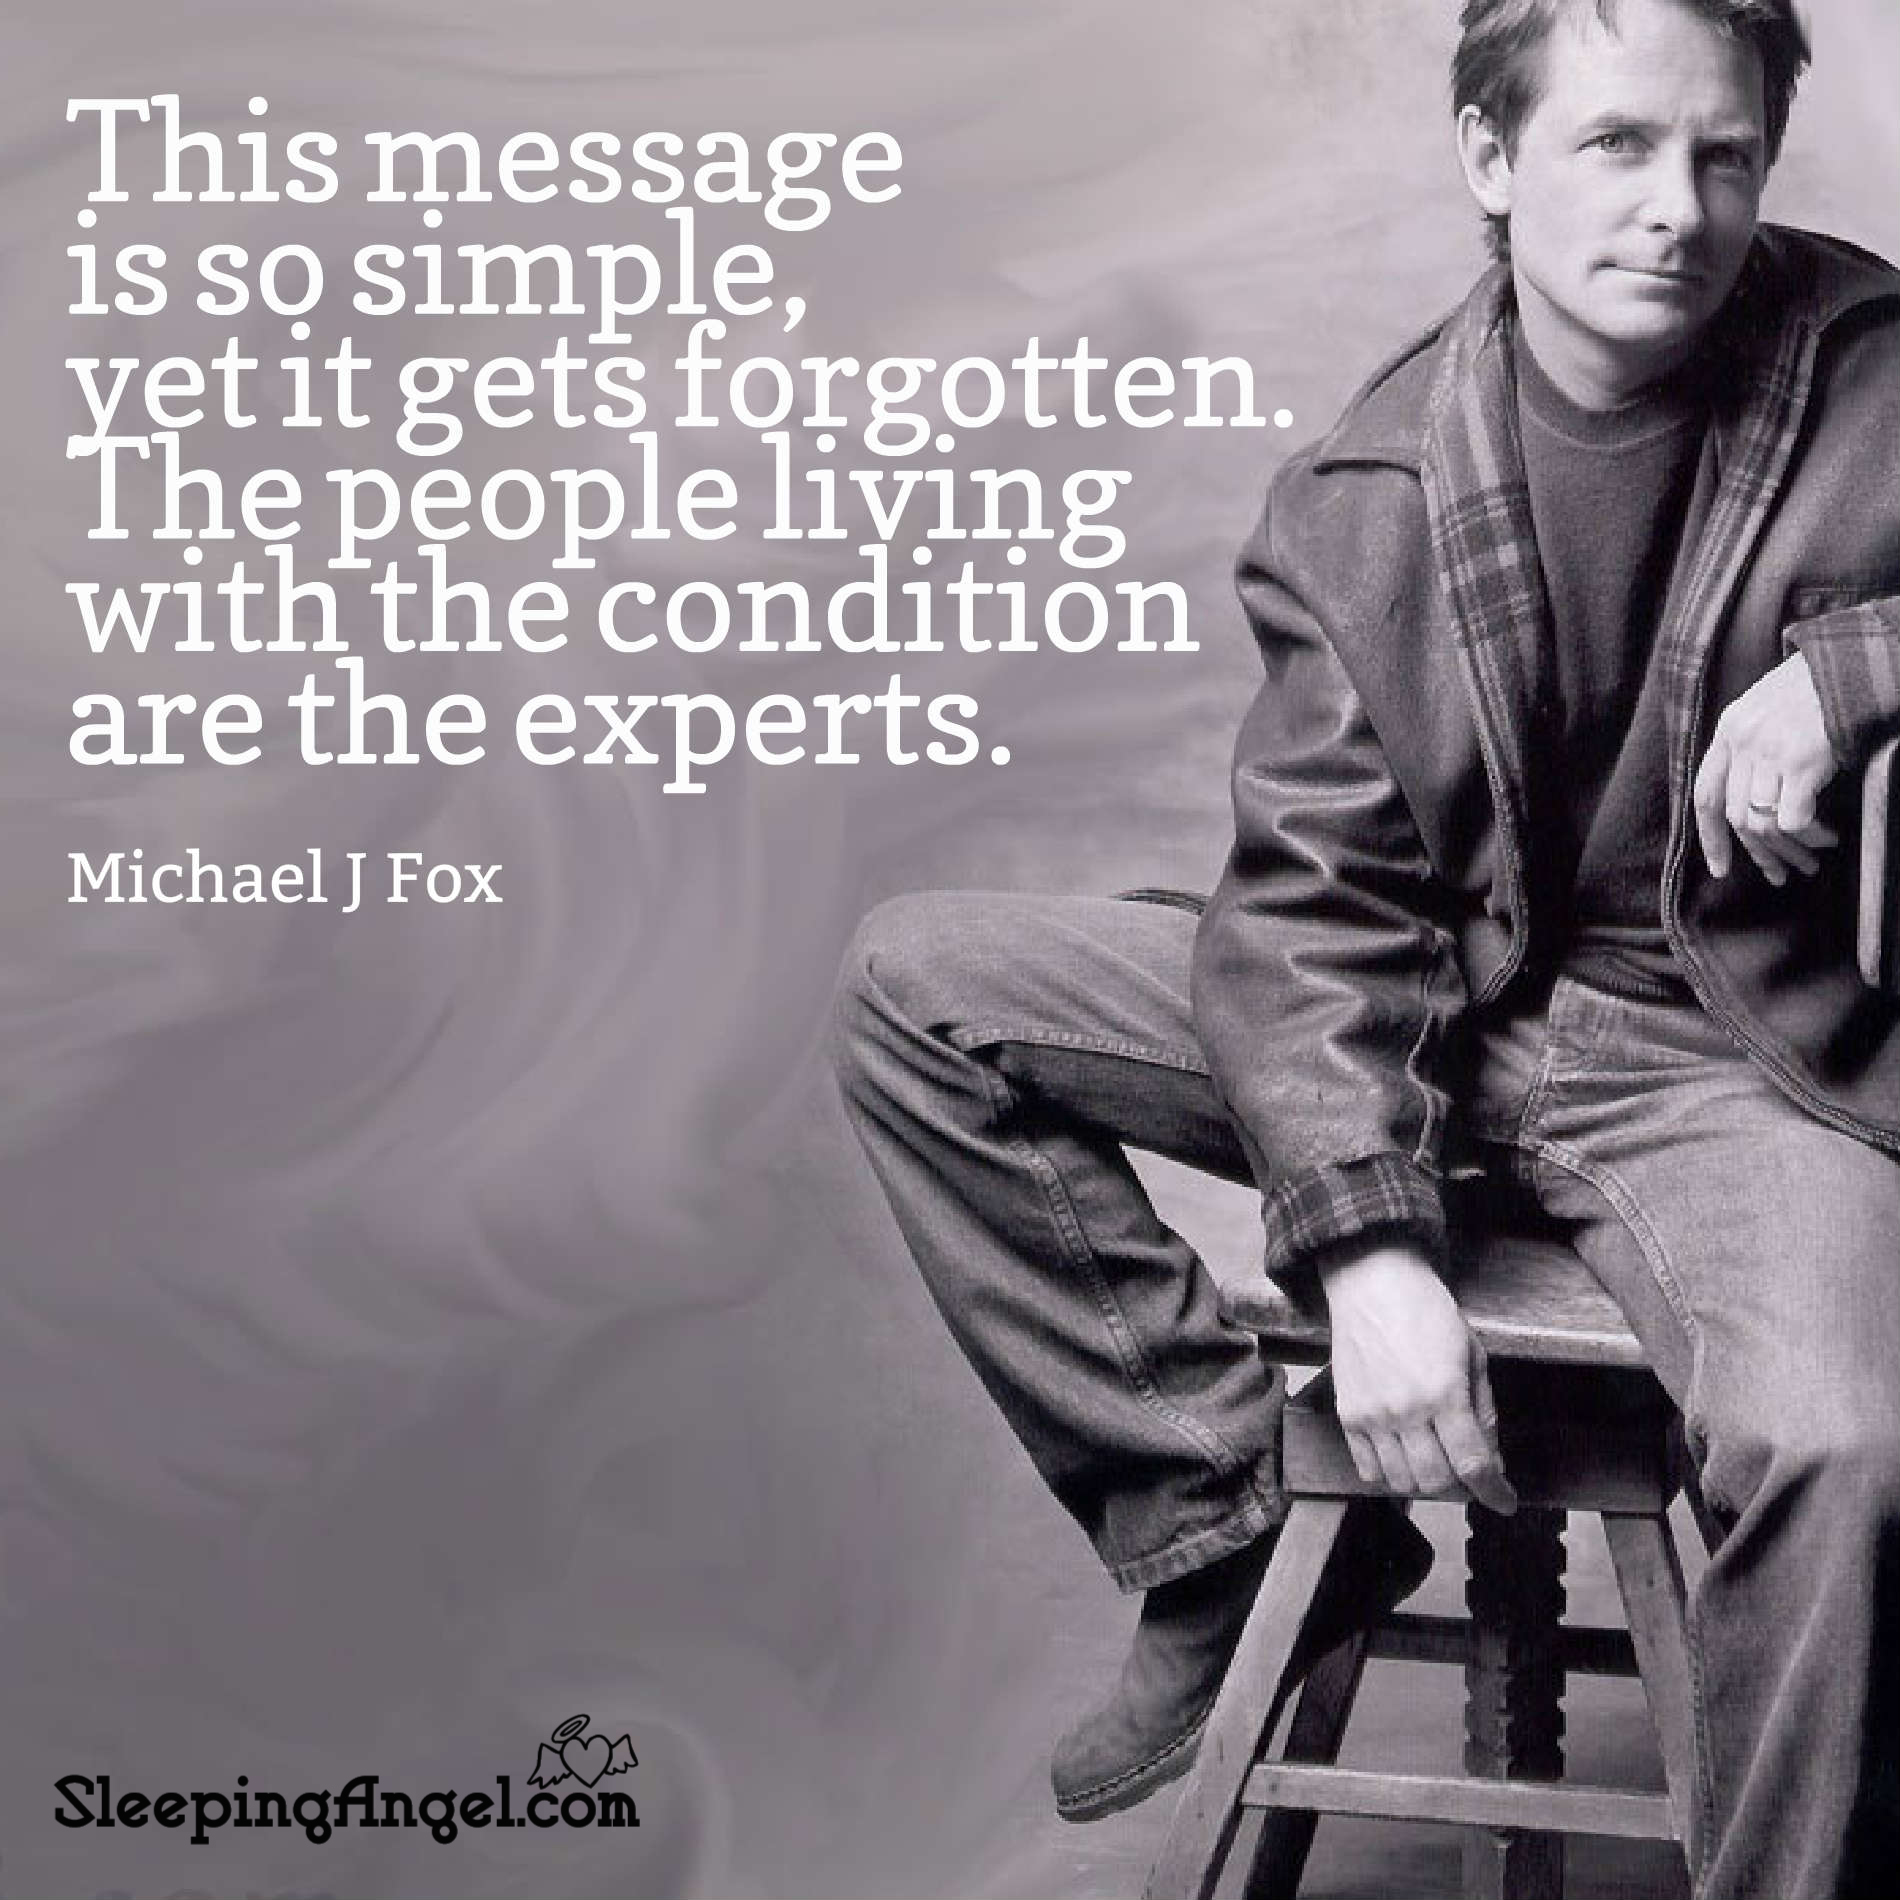 Michael J. Fox Quote